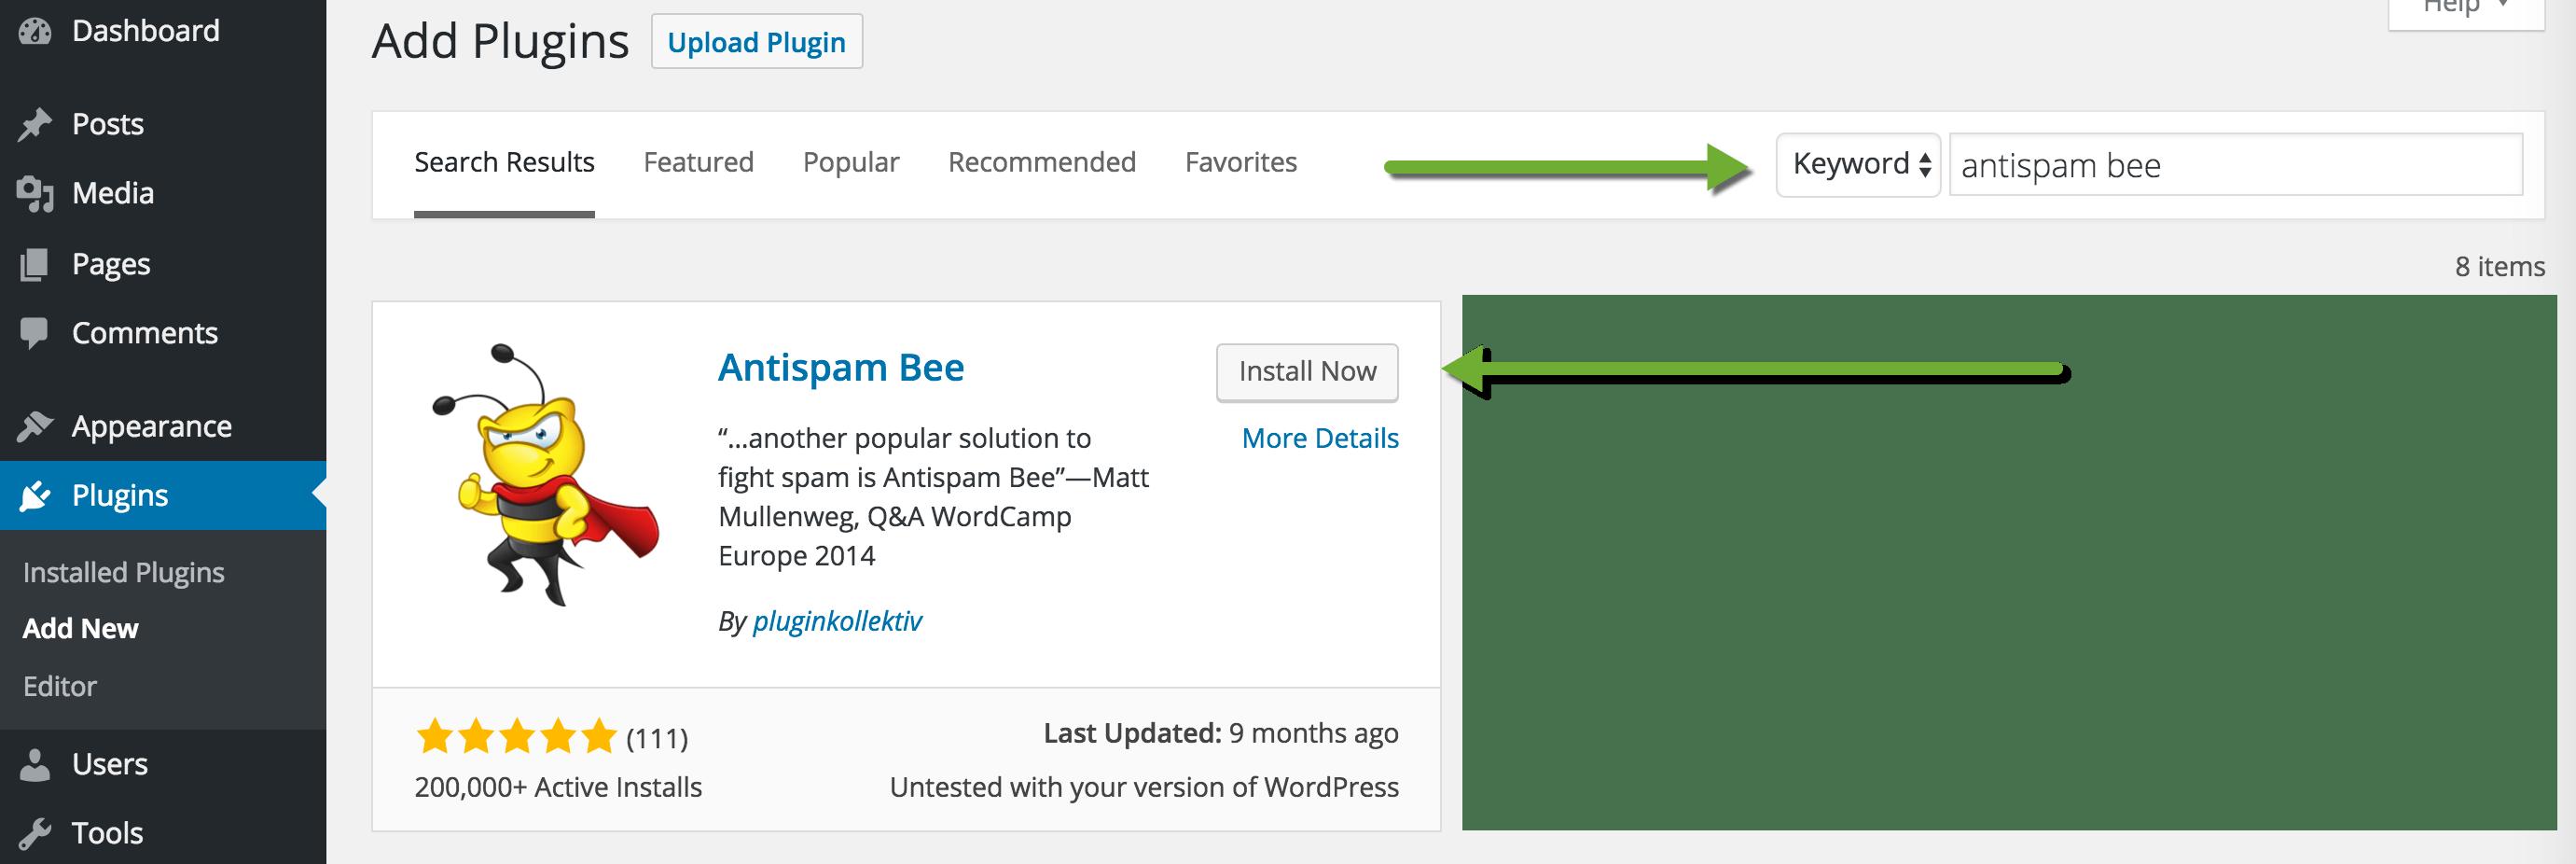 Install Antispam Bee Plugin